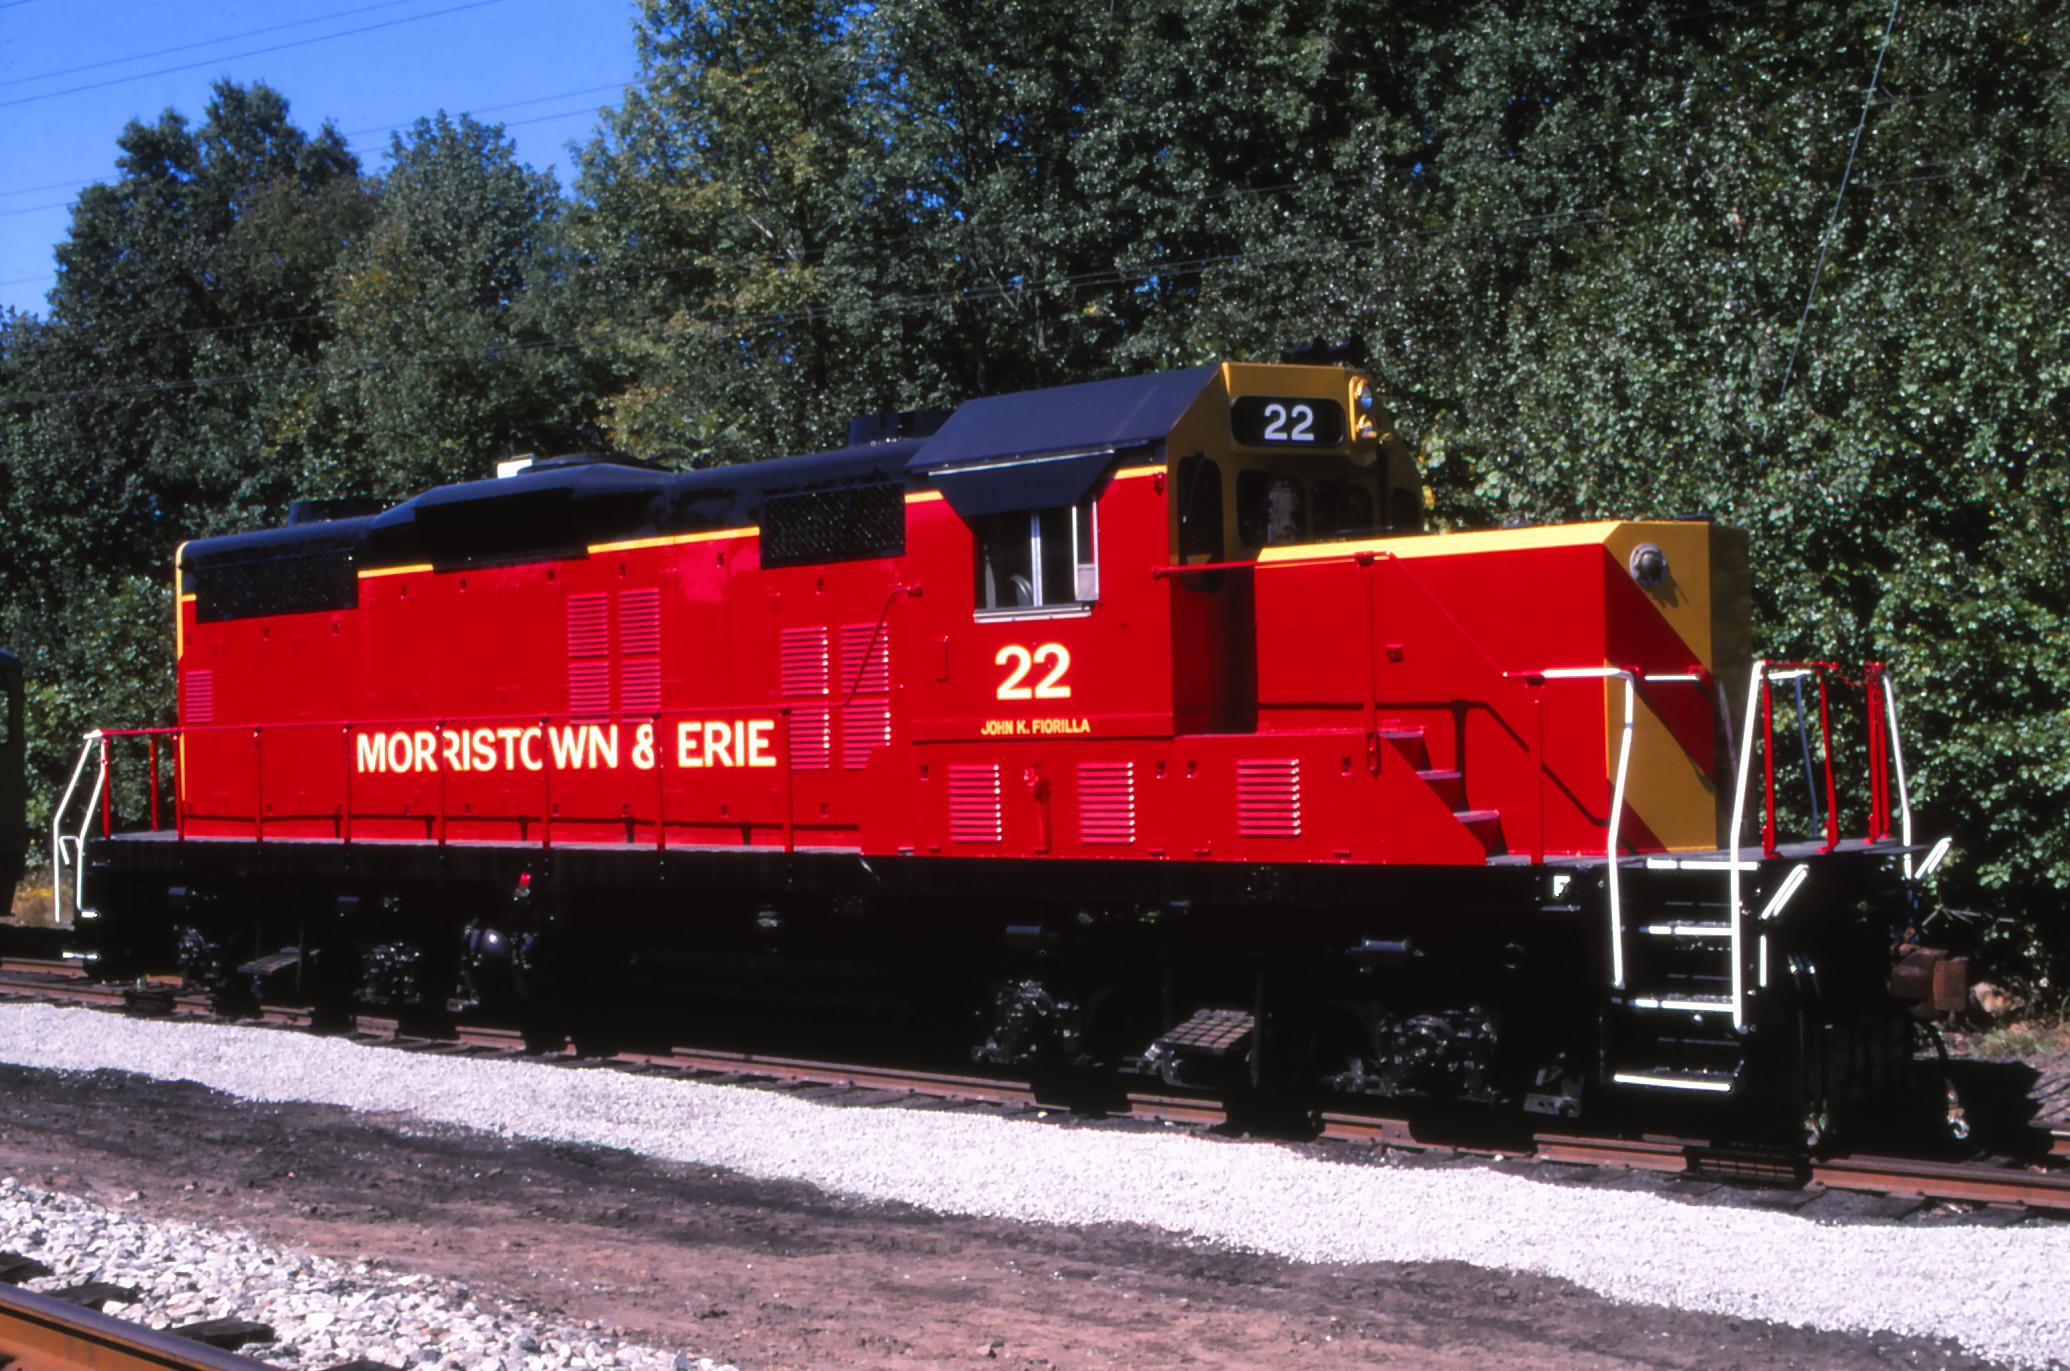 "Morristown & Erie Railway locomotive #22 was christened the ""John K. Fiorilla"" in recognition of Mr. Fiorilla's services to the railroad.  (Sandy Burton photo)"